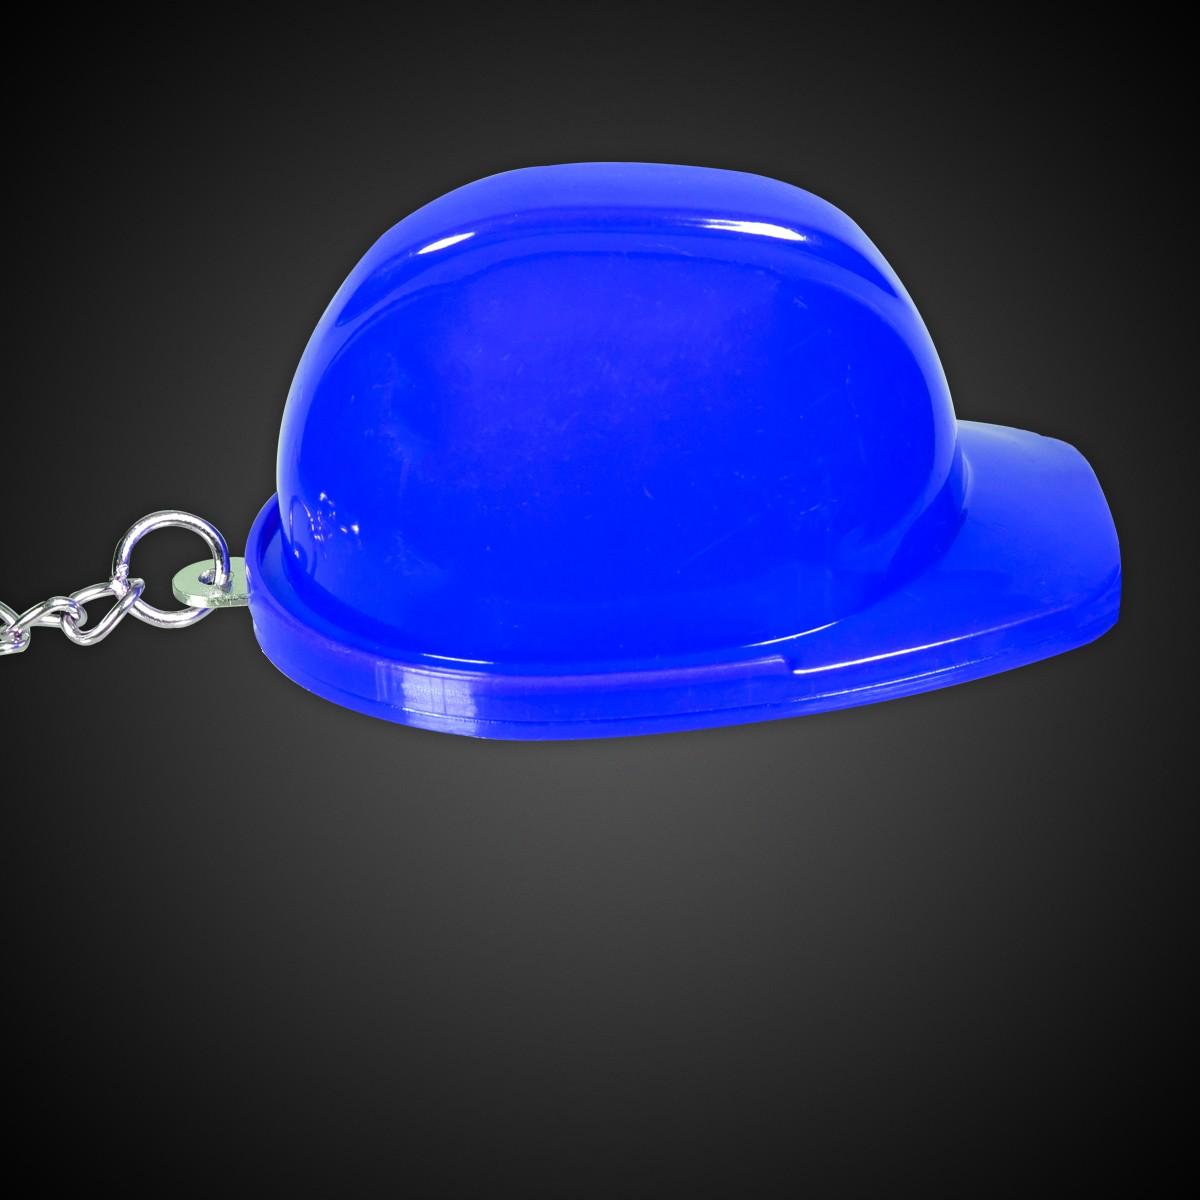 plastic construction hat bottle opener key chains non light up novelties toys. Black Bedroom Furniture Sets. Home Design Ideas